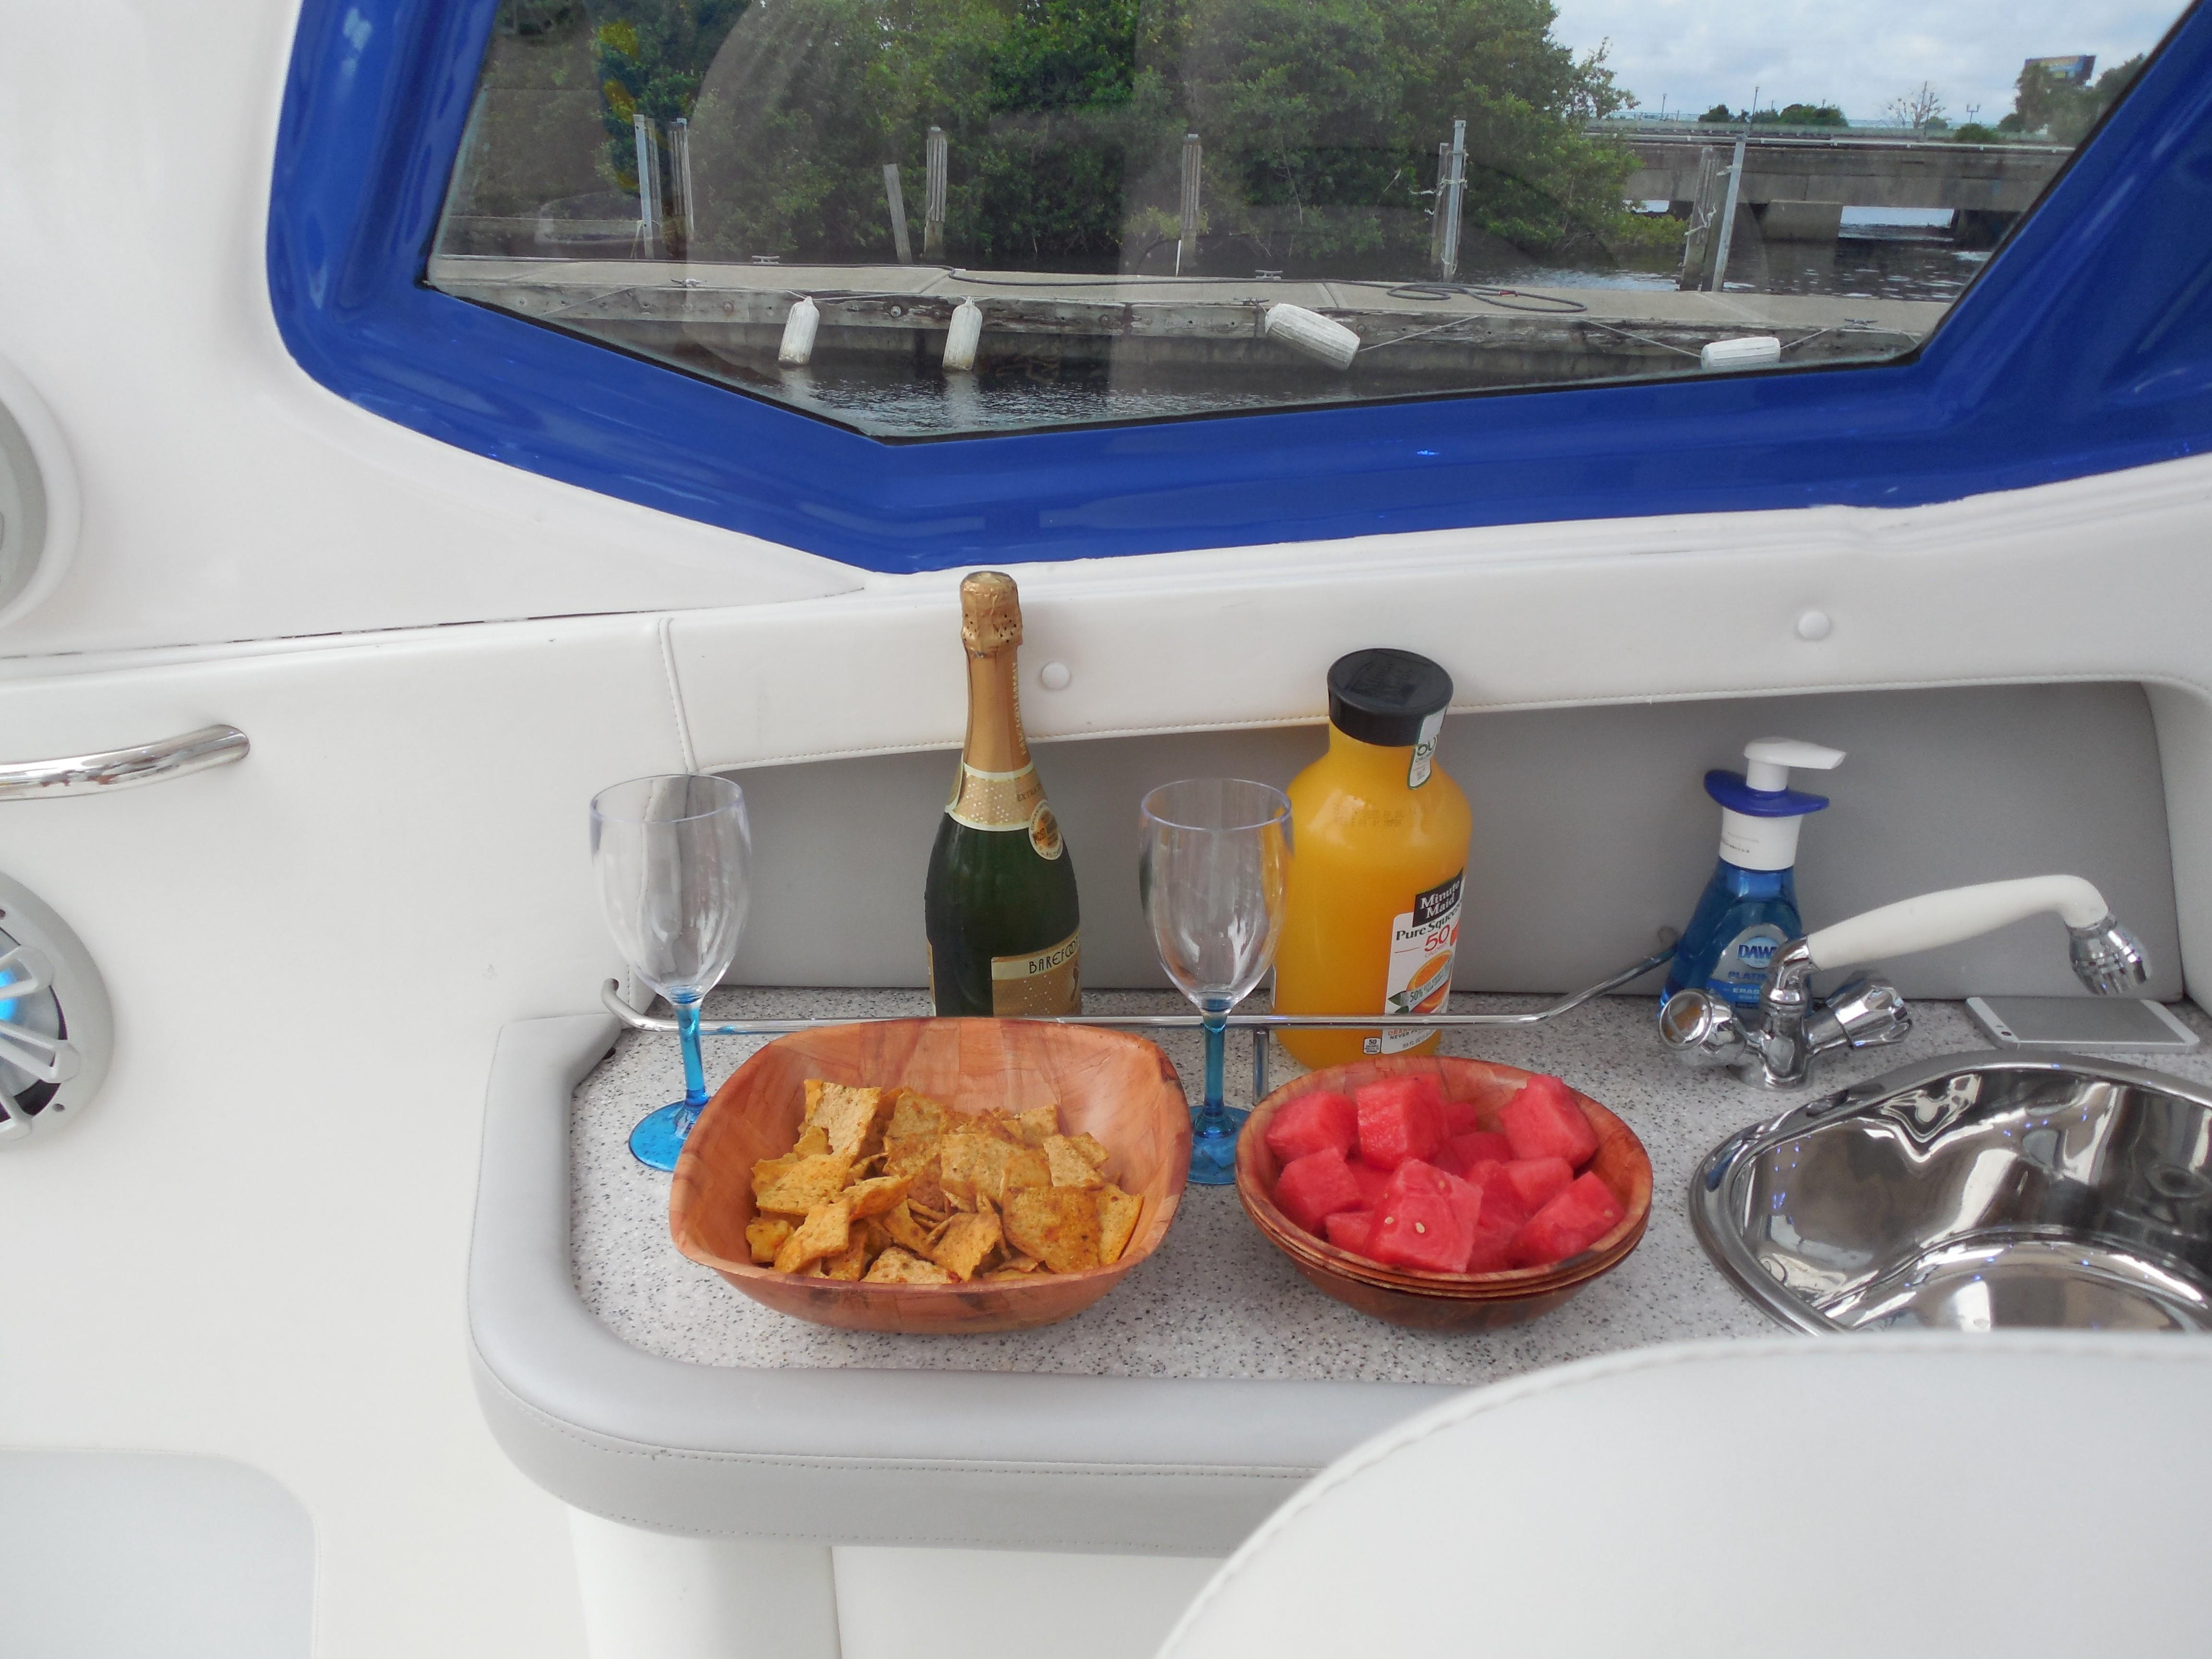 50 Nor Tech 2003 Von Vessel Fort Lauderdale Florida